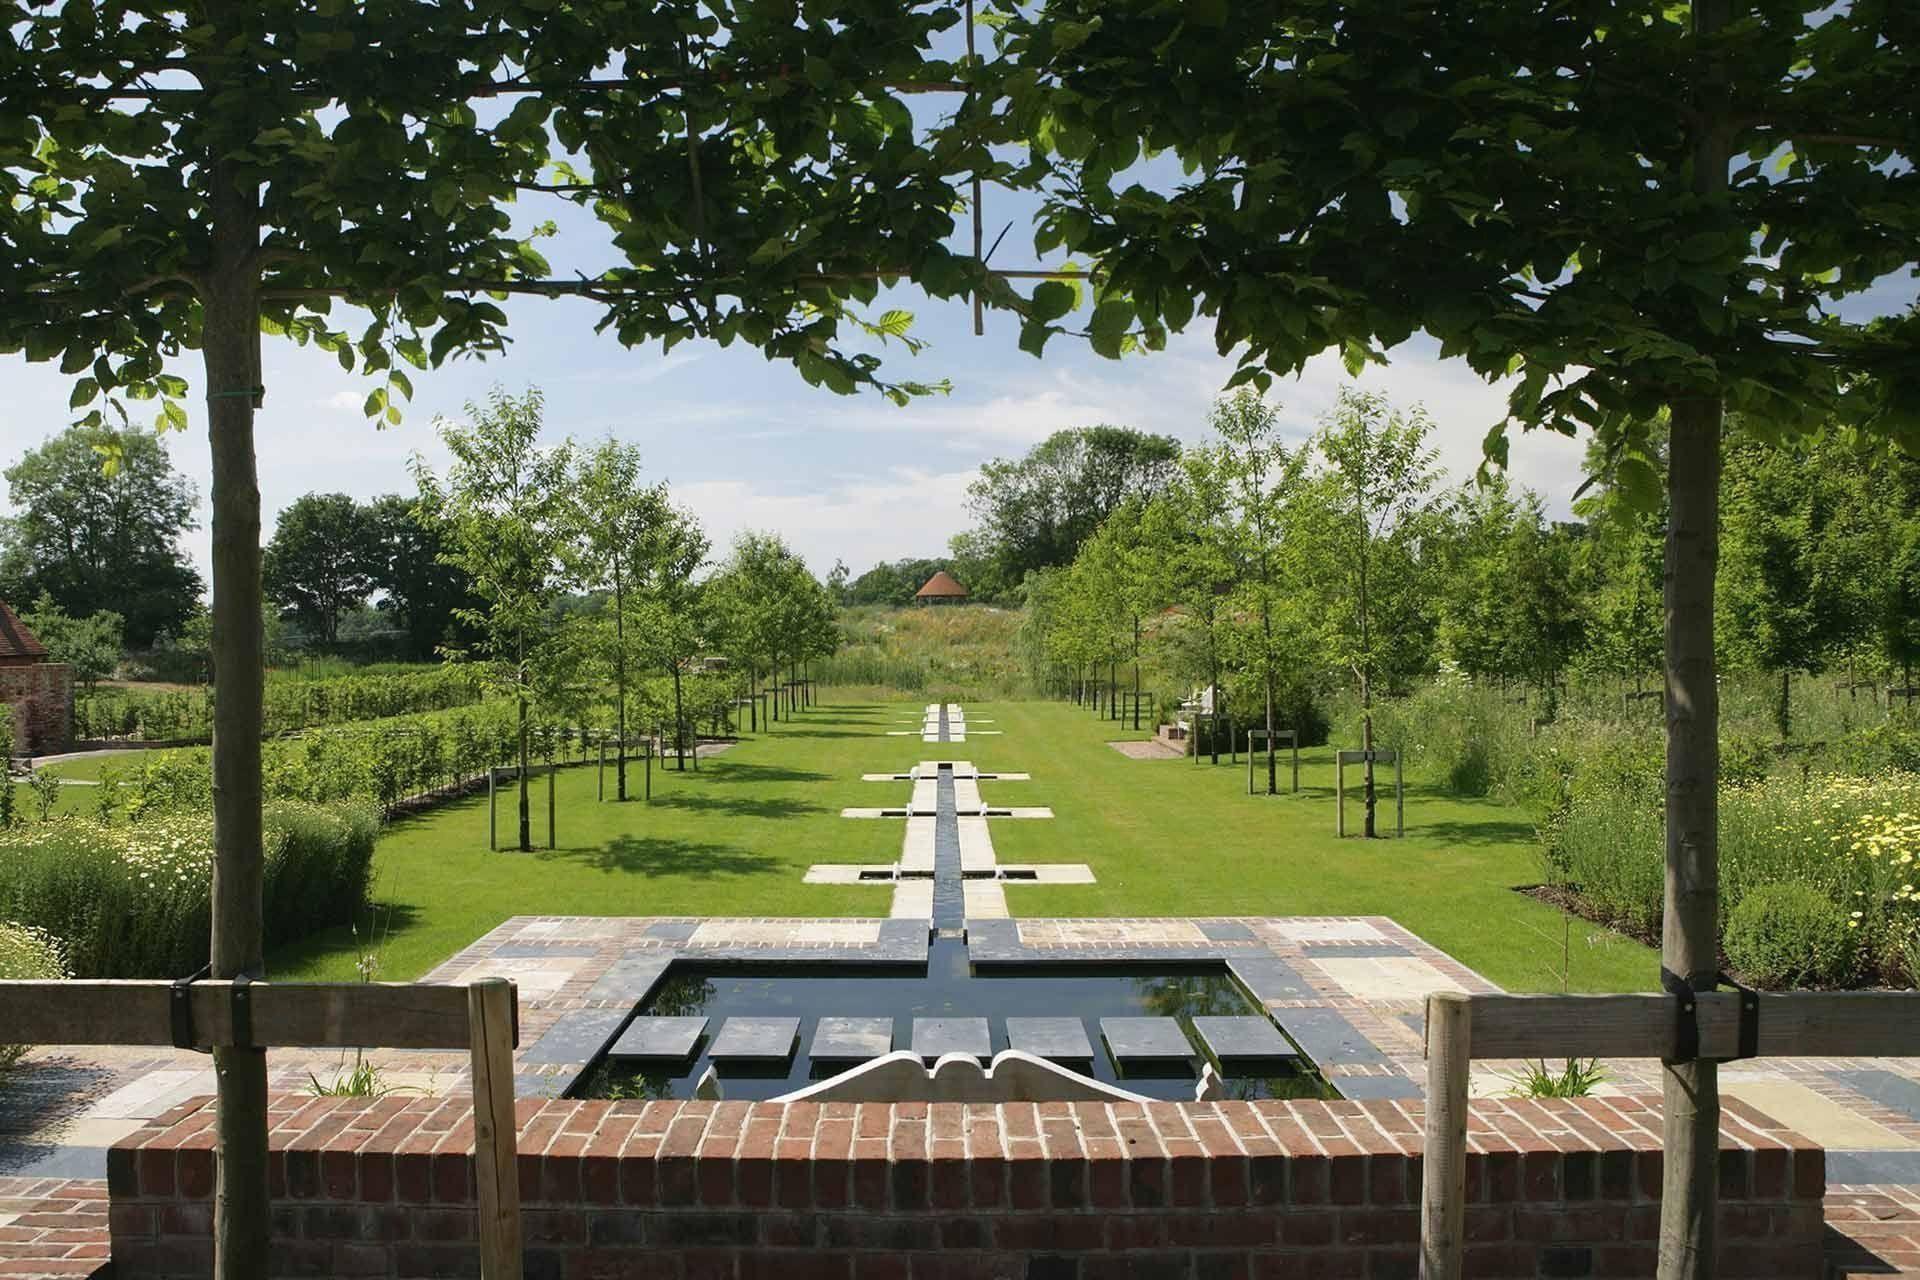 Garden And Landscape Designers Cheltenham Gloucestershire Cotswolds Www Ch 1000 In 2020 Garden Design Water Features In The Garden Landscape Design Melbourne